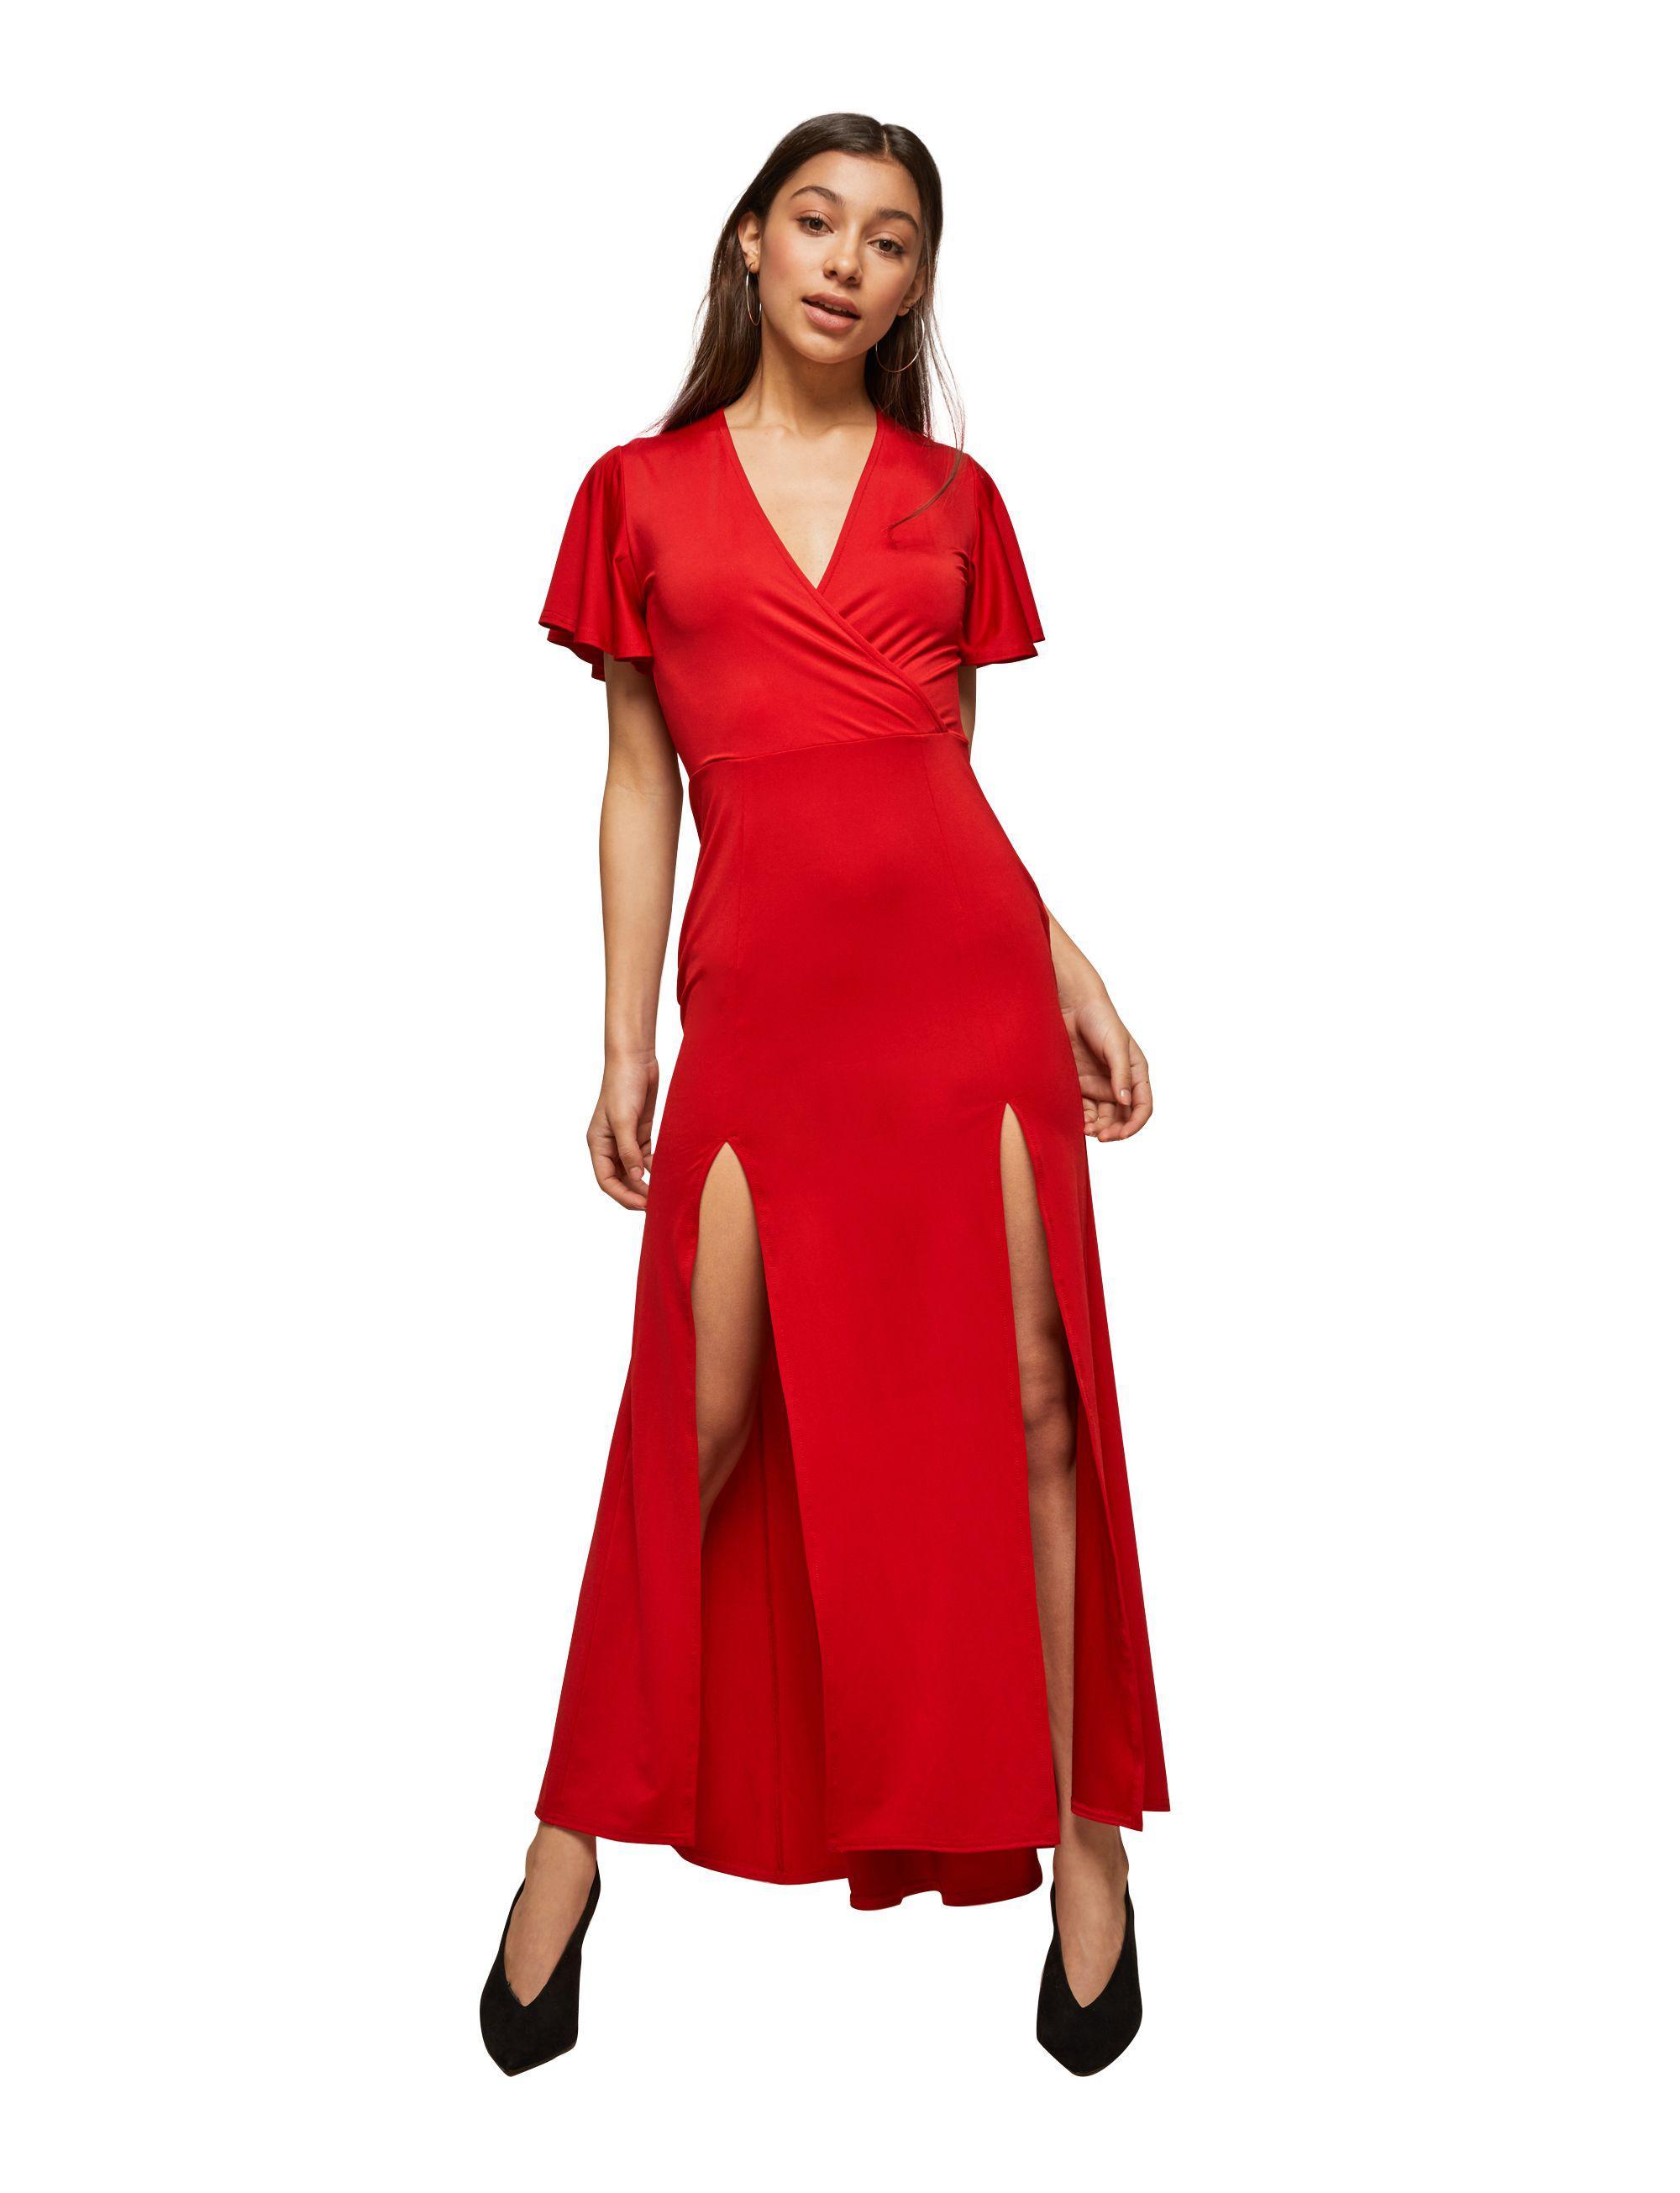 b8252637910 Formal Maxi Dresses Petite - Gomes Weine AG